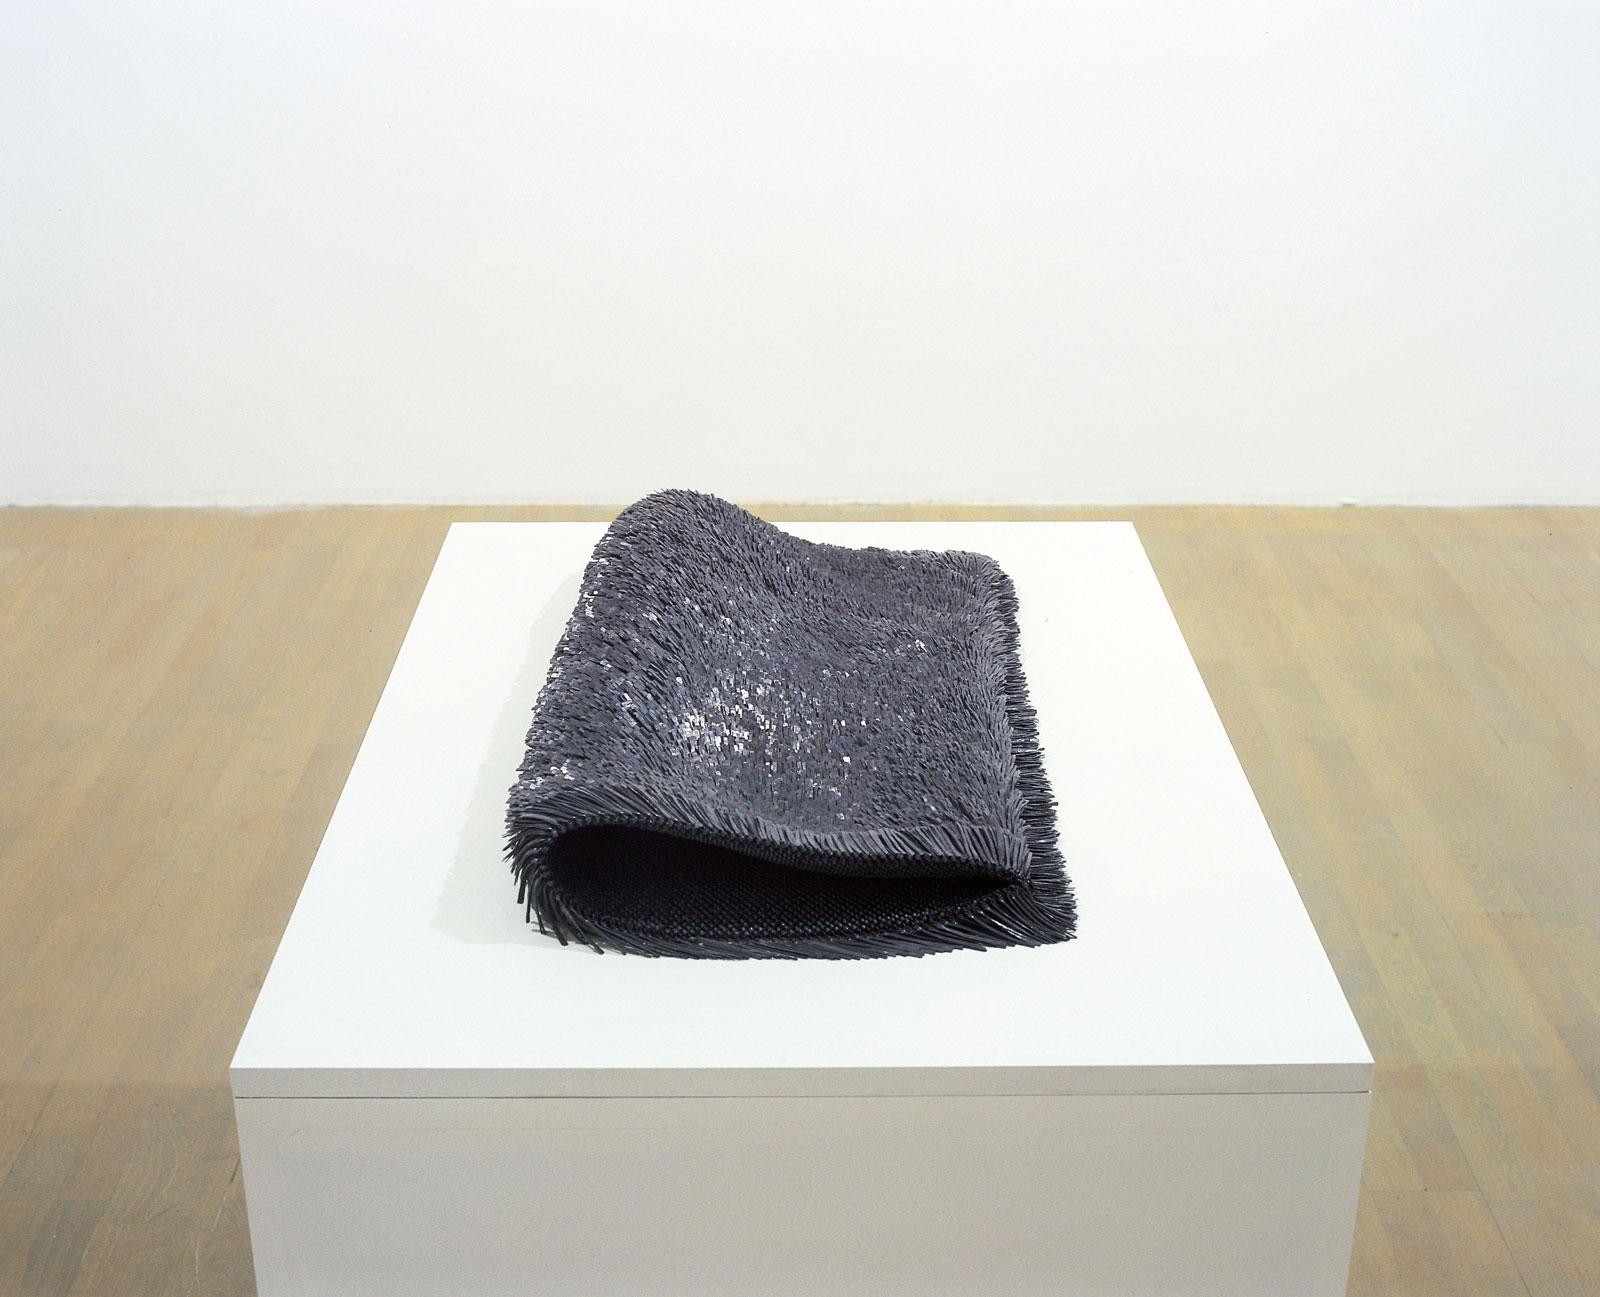 Sculpture II, 1998-1999, lead, steel, 9 x 76 x 39 cm